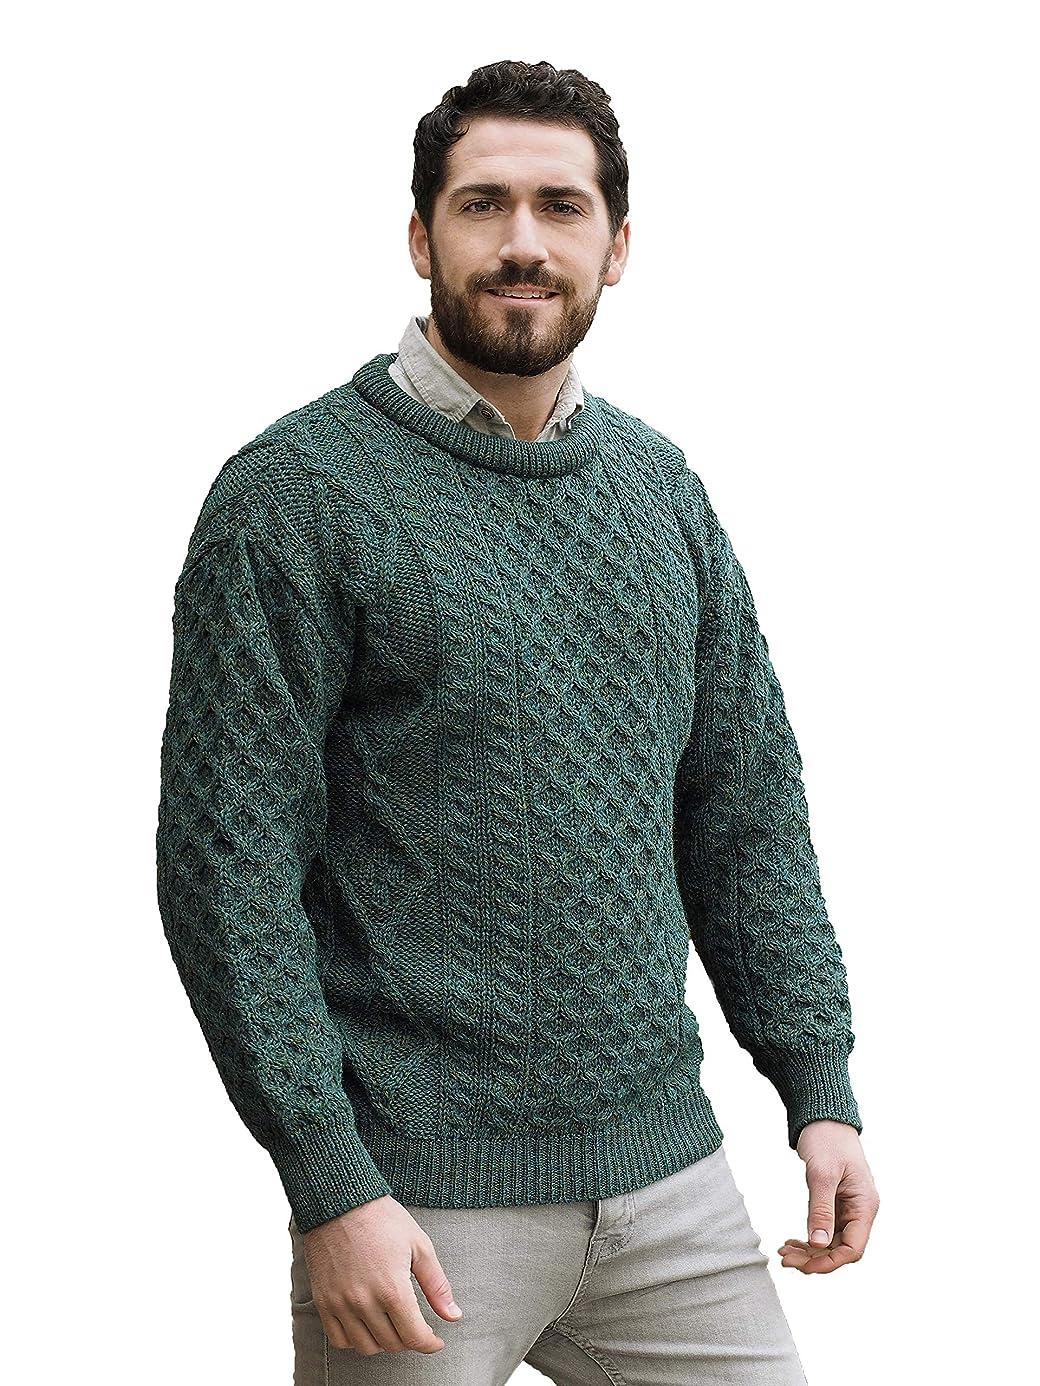 Aran Crafts Traditional Aran Crew Neck Sweater (100% Pure New Wool) Ecru, Skiddaw, Blackwatch Colors clr3088698